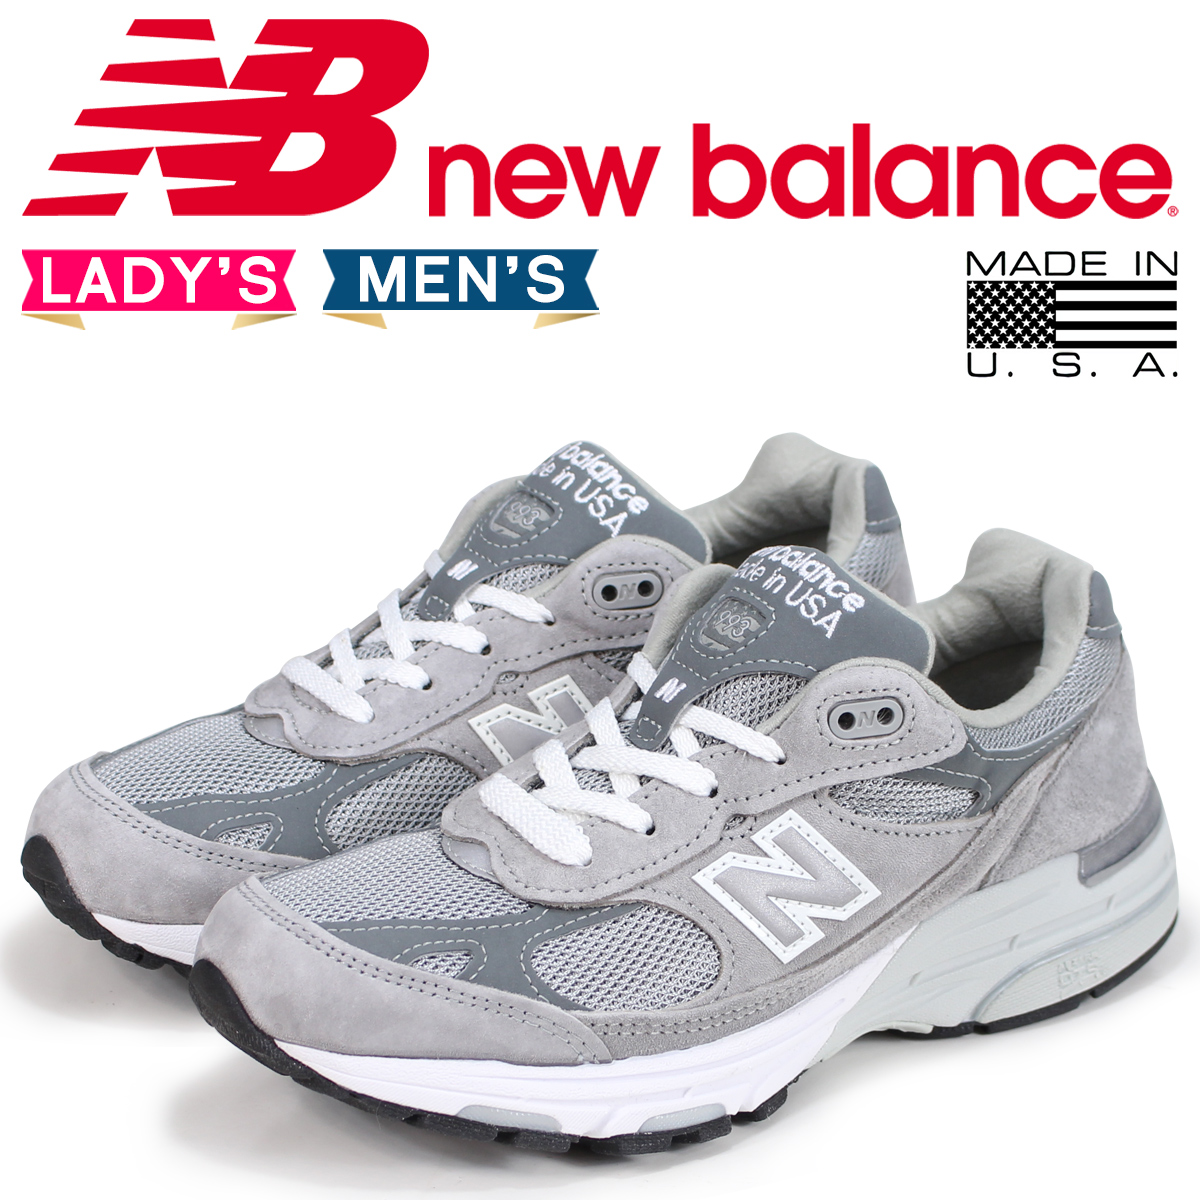 new balance usa online shopping